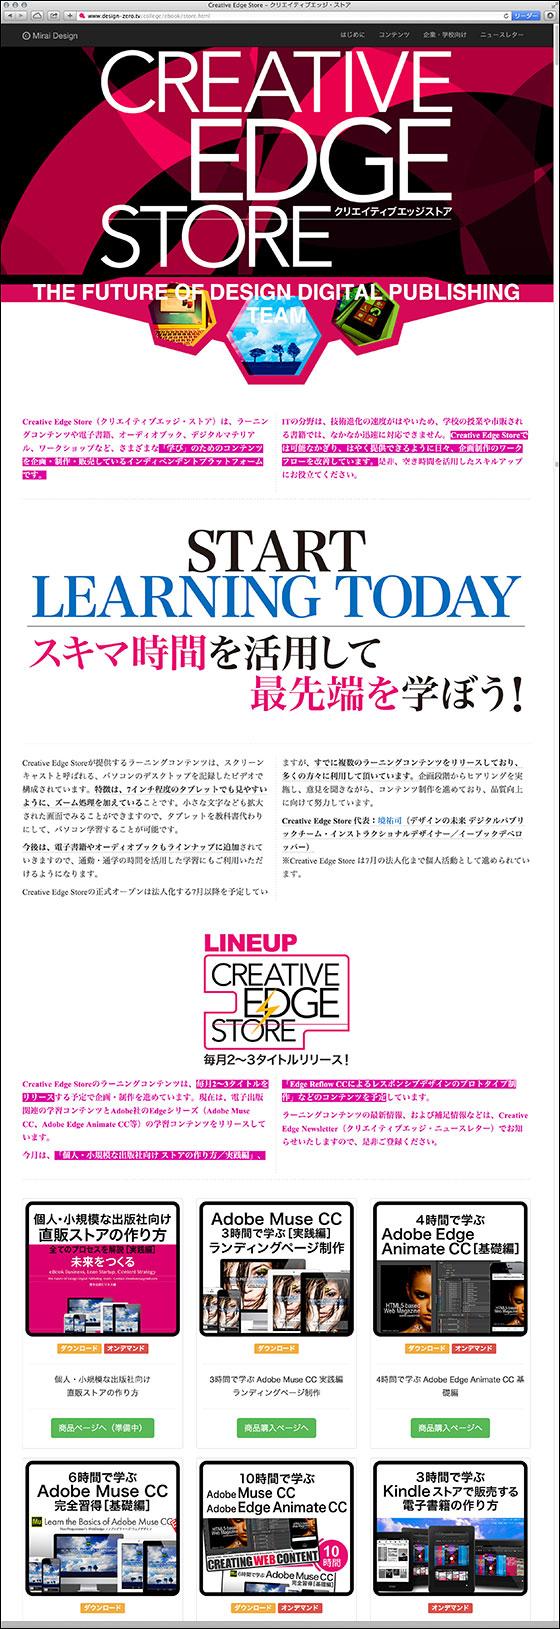 Creative Edge Store